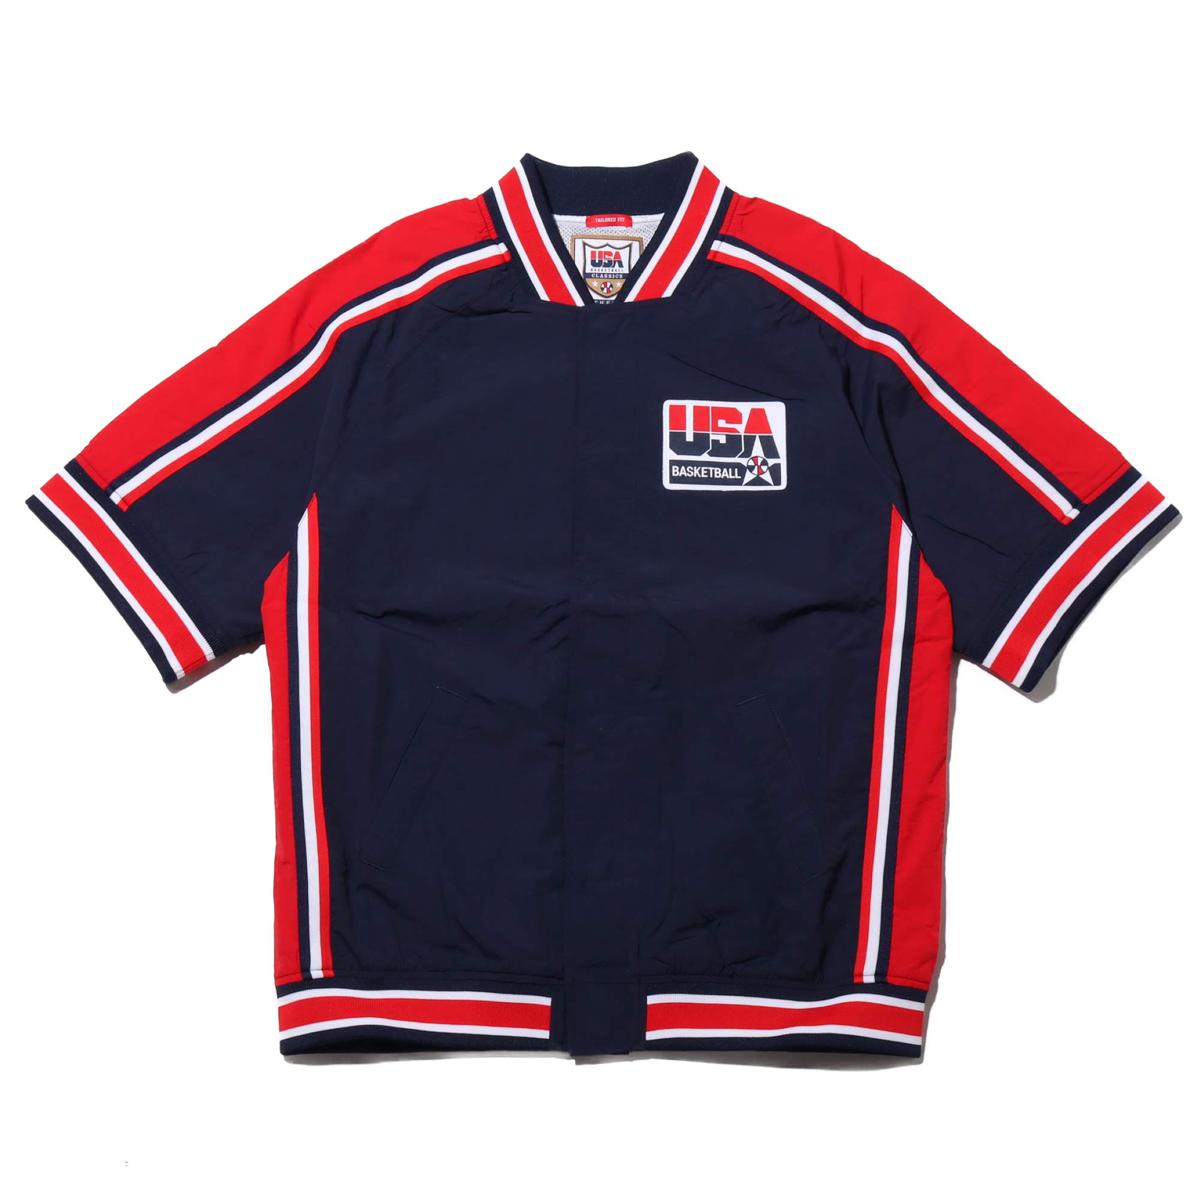 Mitchell & Ness Auth WU Jacket - USA92 M.Jordan(NAVY)(ミッチェルアンドネス マイケル・ジョーダン ウォーミングアップジャケット)【メンズ】【半袖Tシャツ】【19FW-I】